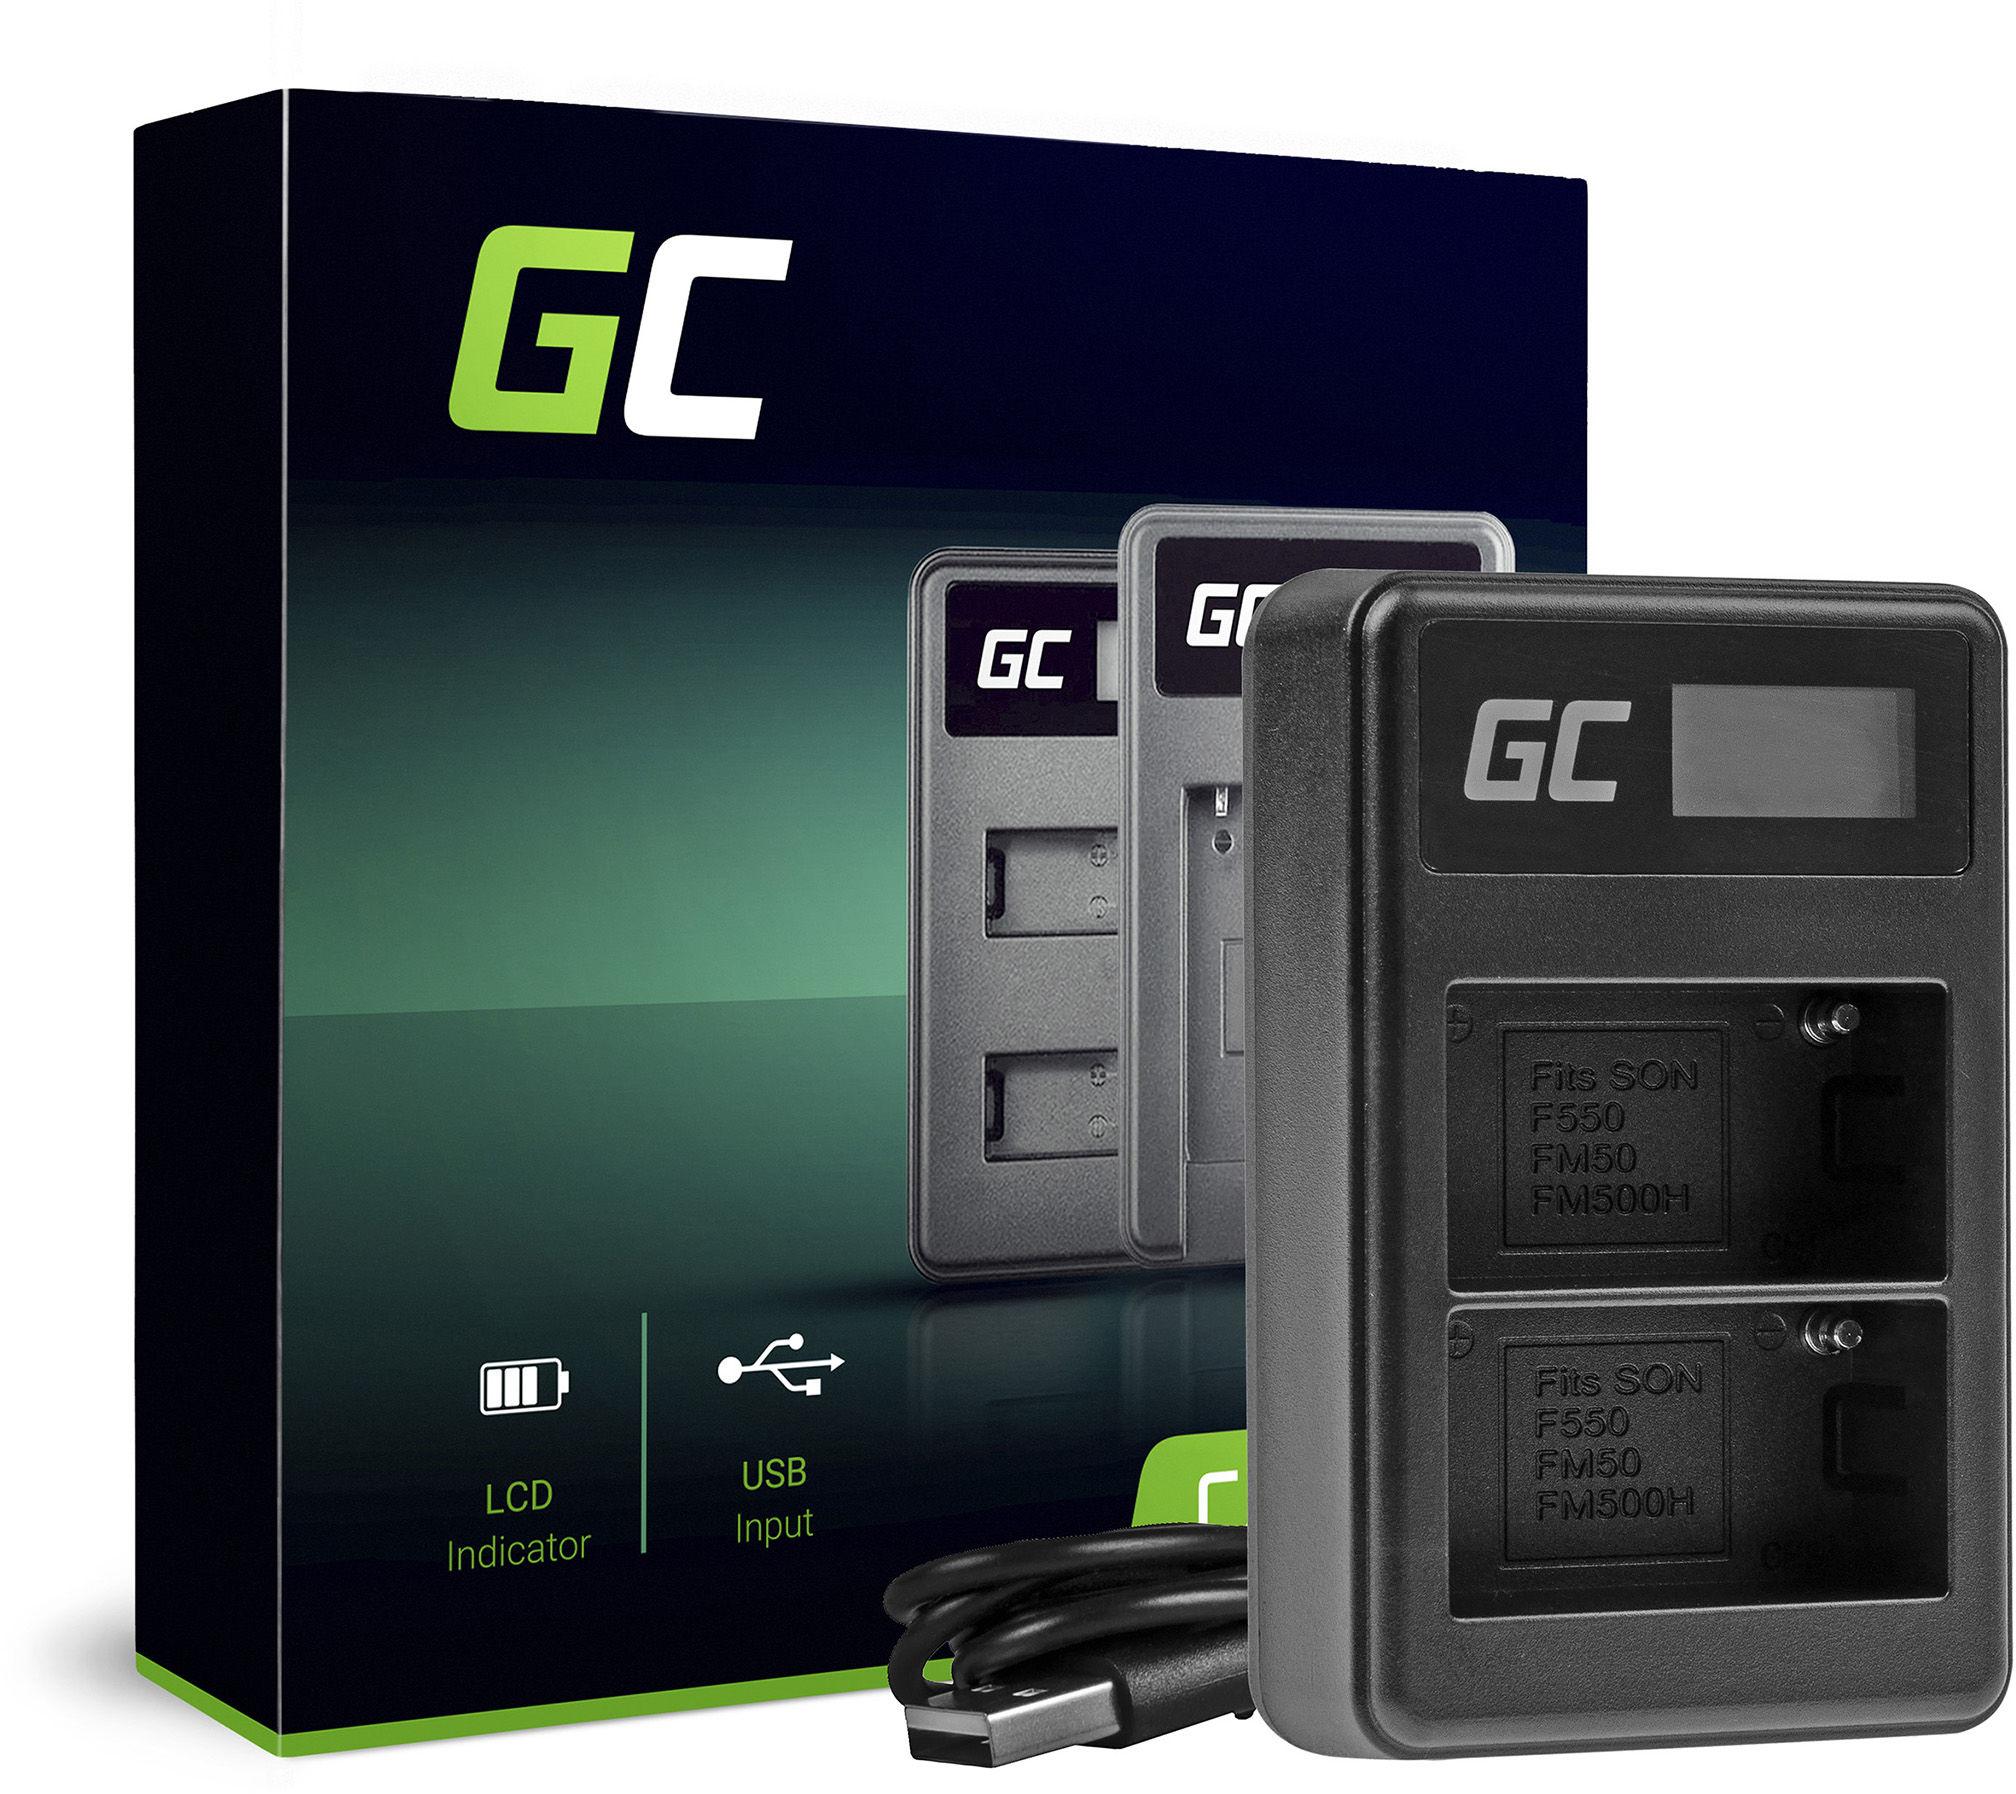 Podwójna ładowarka BC-V615 AC-VL1 Green Cell  do Sony NP-FM500H, A58 A57 A65 A77 A99 A900 A700 A580 A560 A550 A850 SLT A99 II